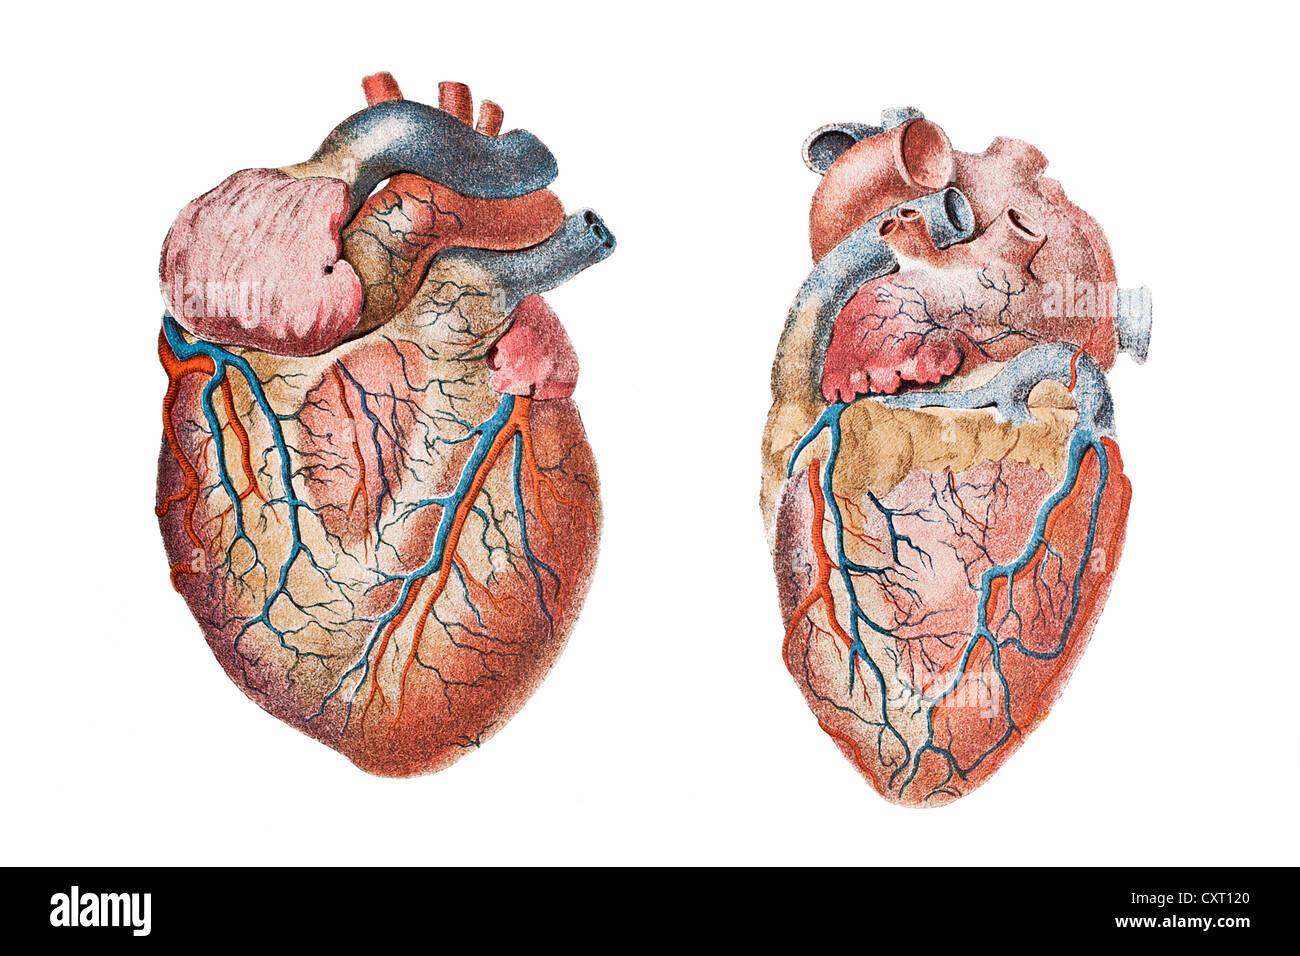 Anatomical Drawing Heart Stock Photos Anatomical Drawing Heart